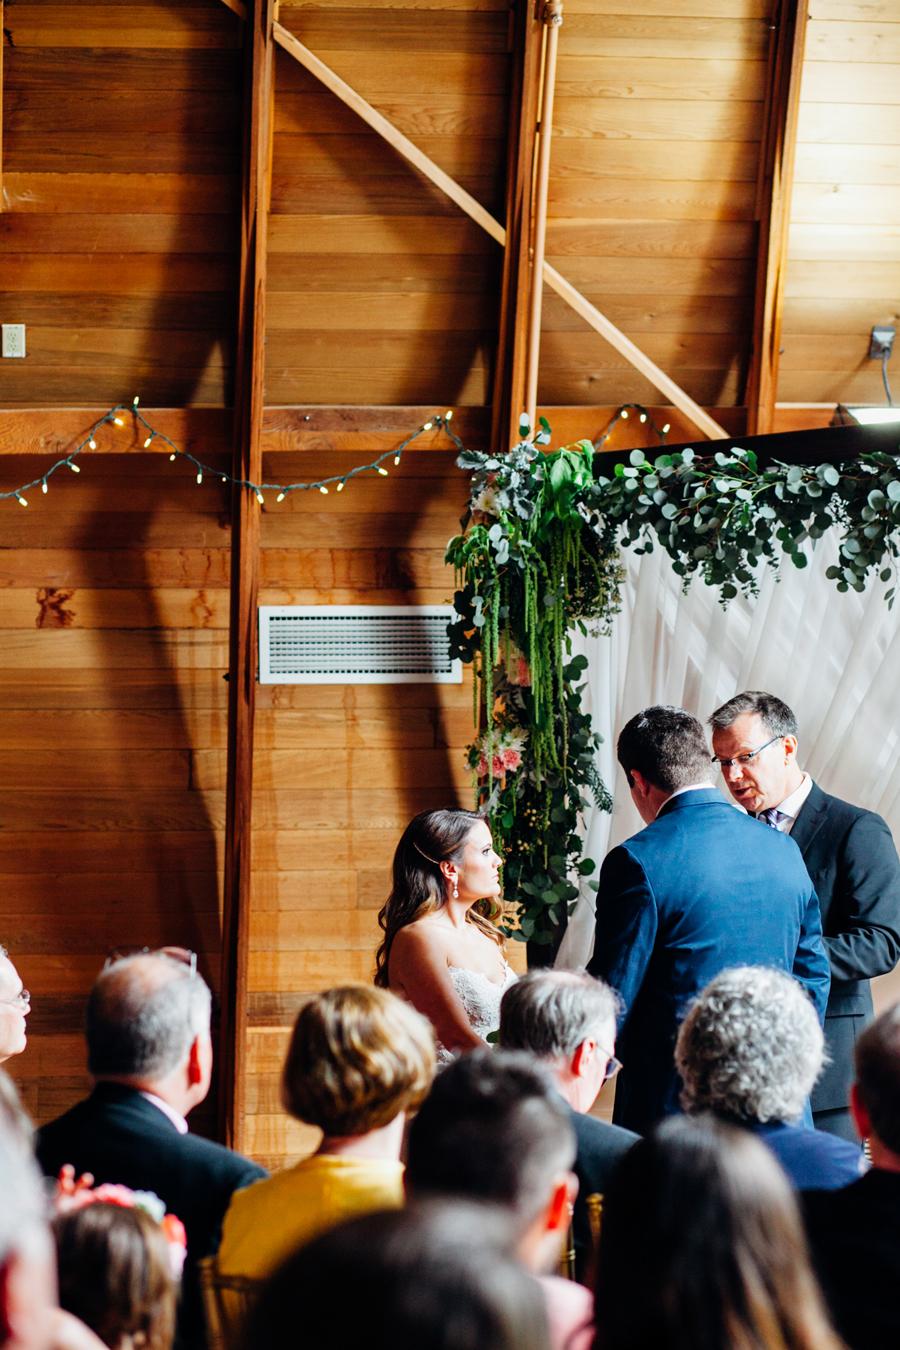 069-seattle-bothell-wedding-photographer-russells-restaurant-wilkins-photo.jpg